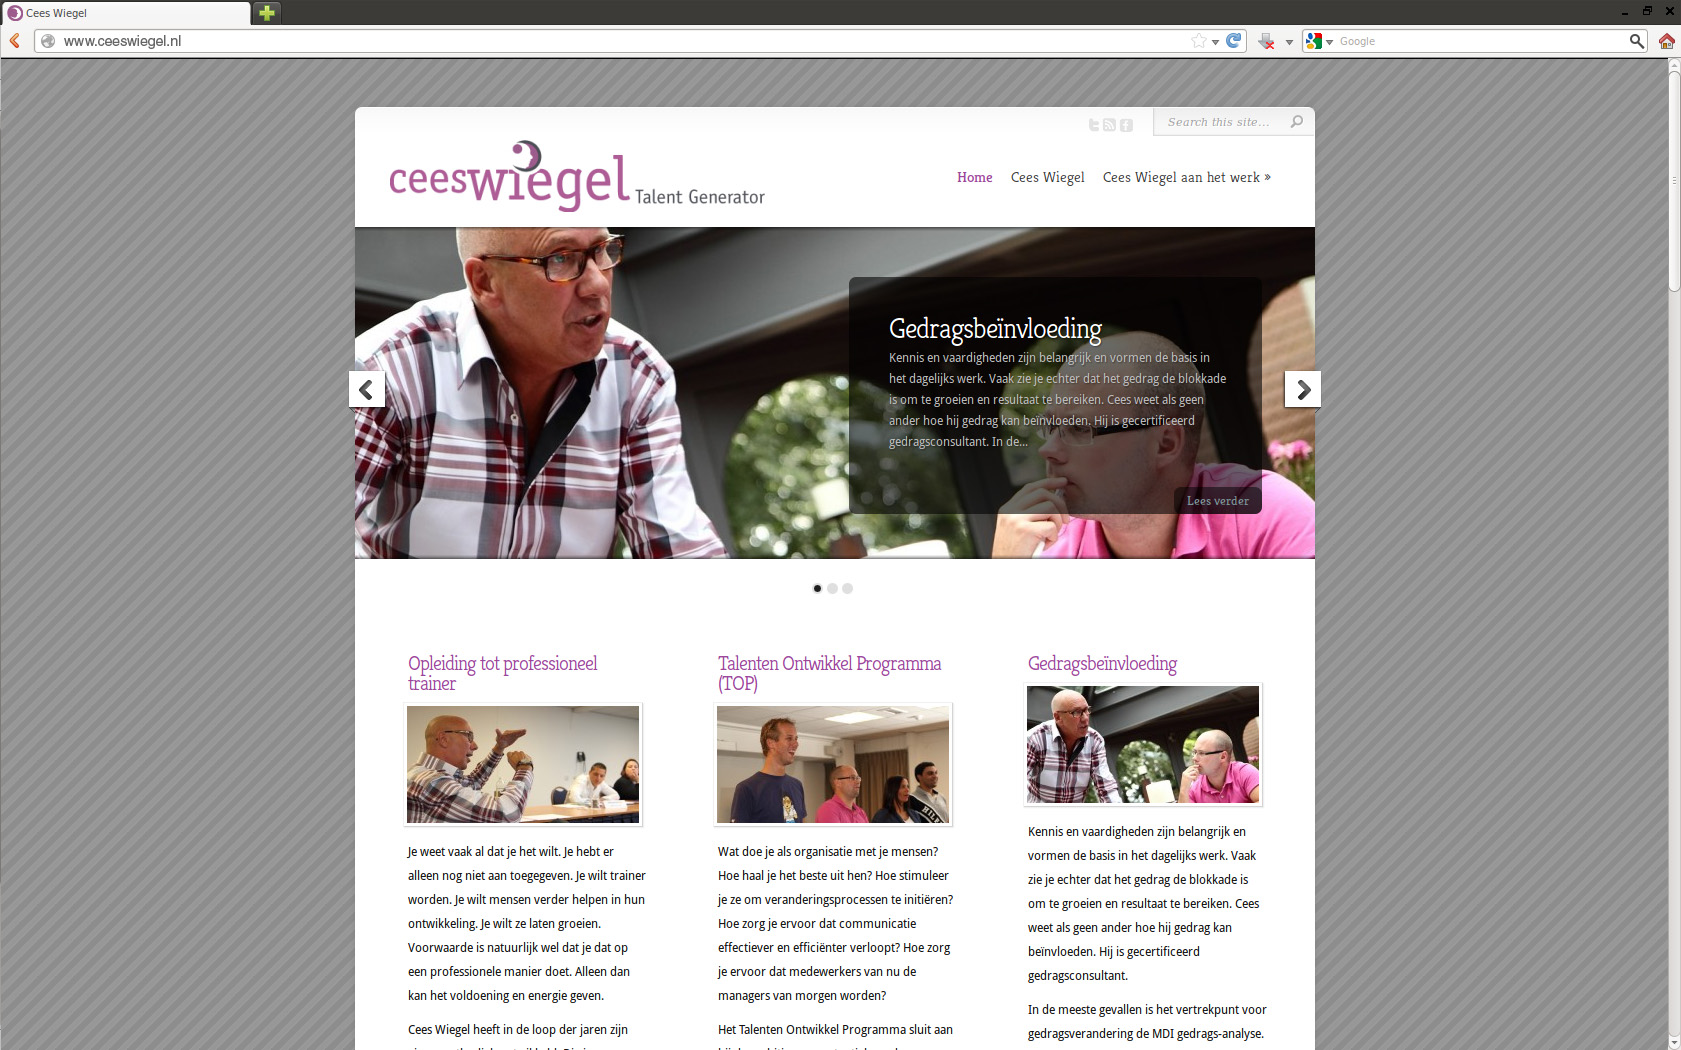 ceeswiegel.nl